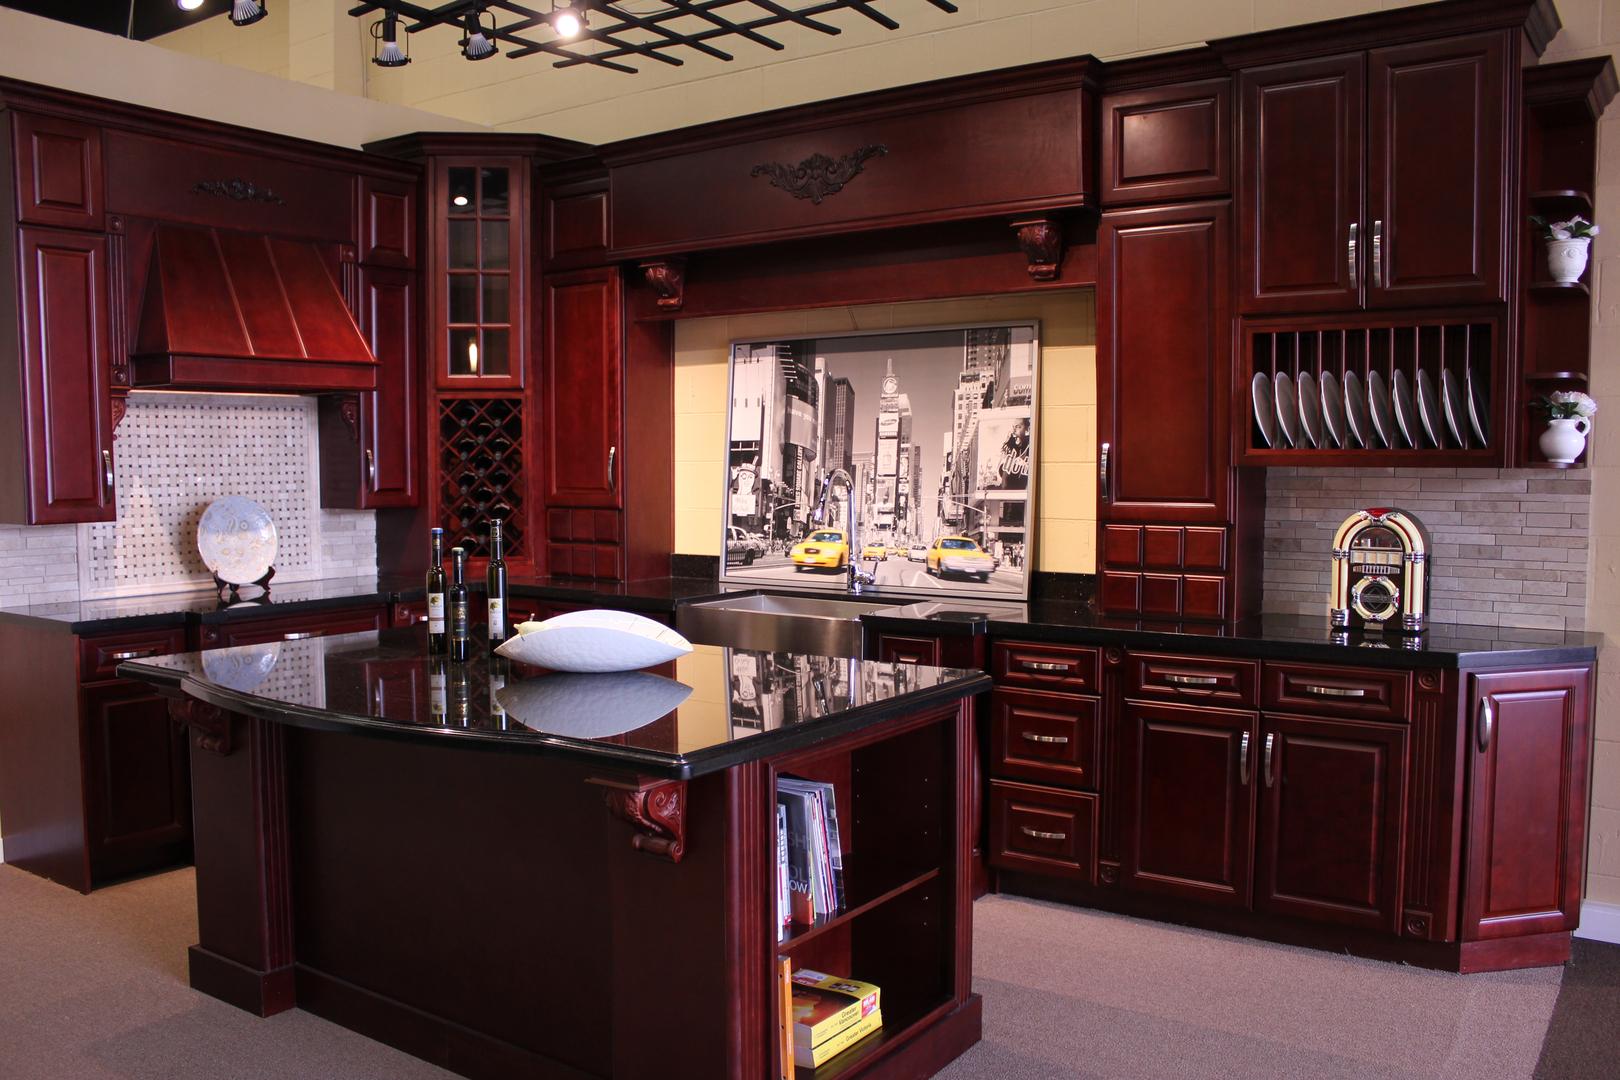 кухни вишневого цвета фото размещайте рядом